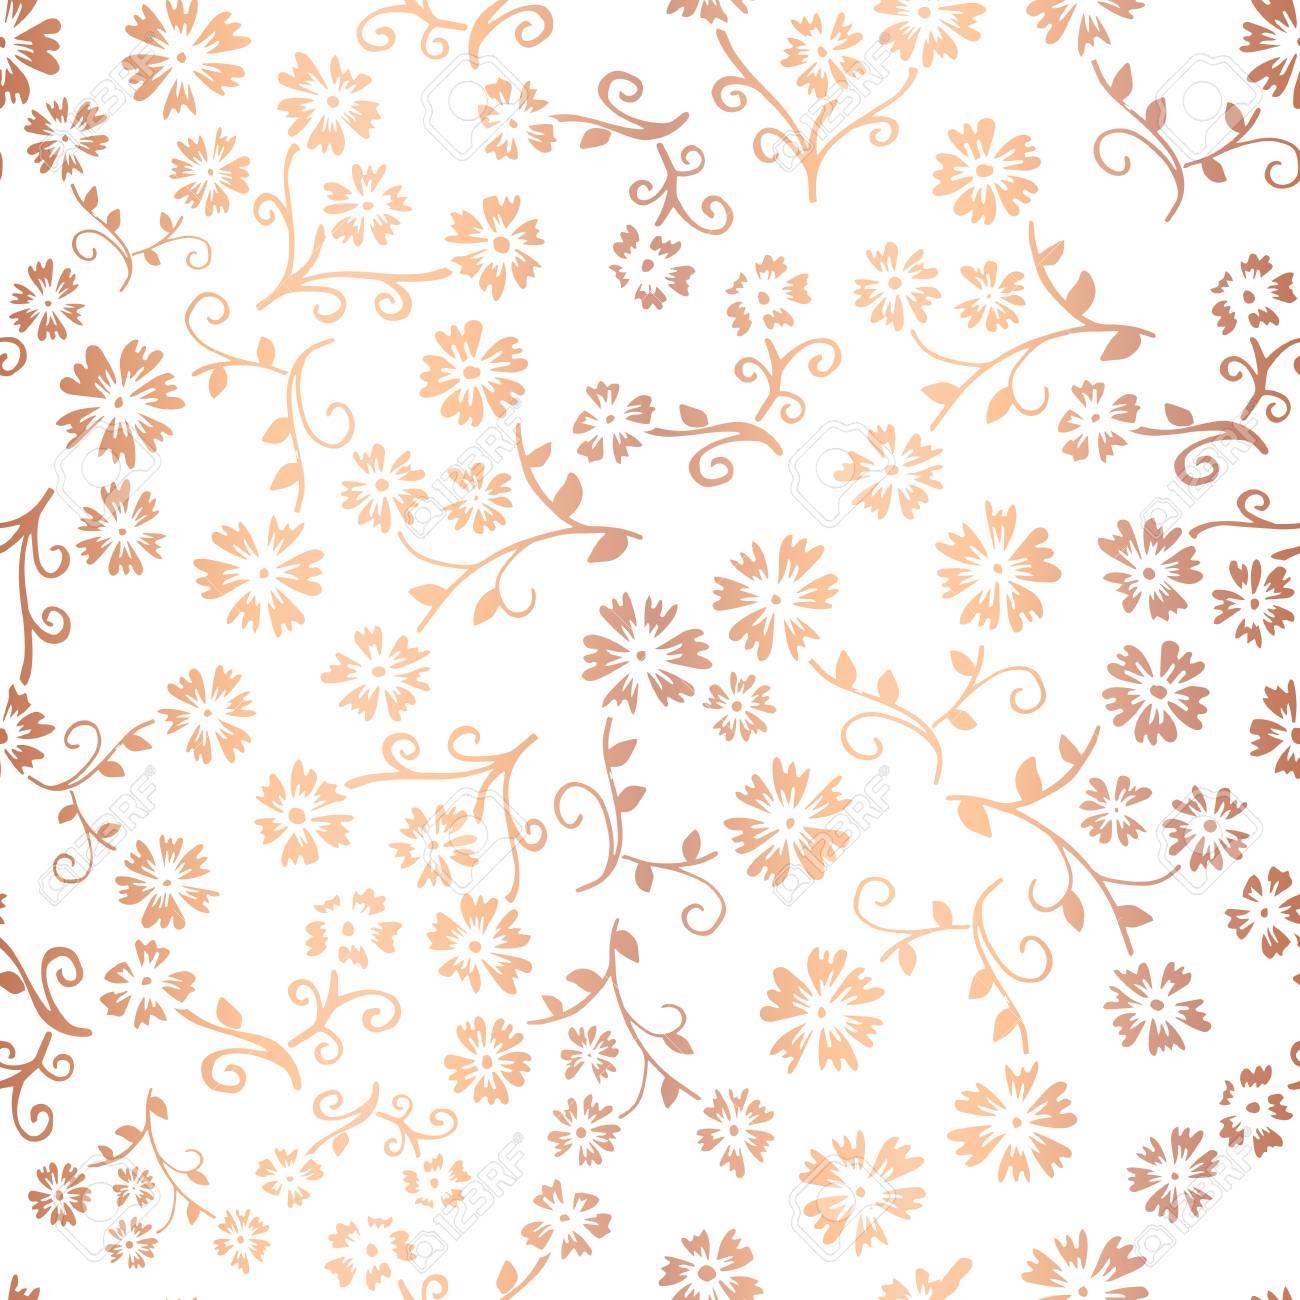 Copper Foil Flower Vector Seamless Pattern Background Elegant